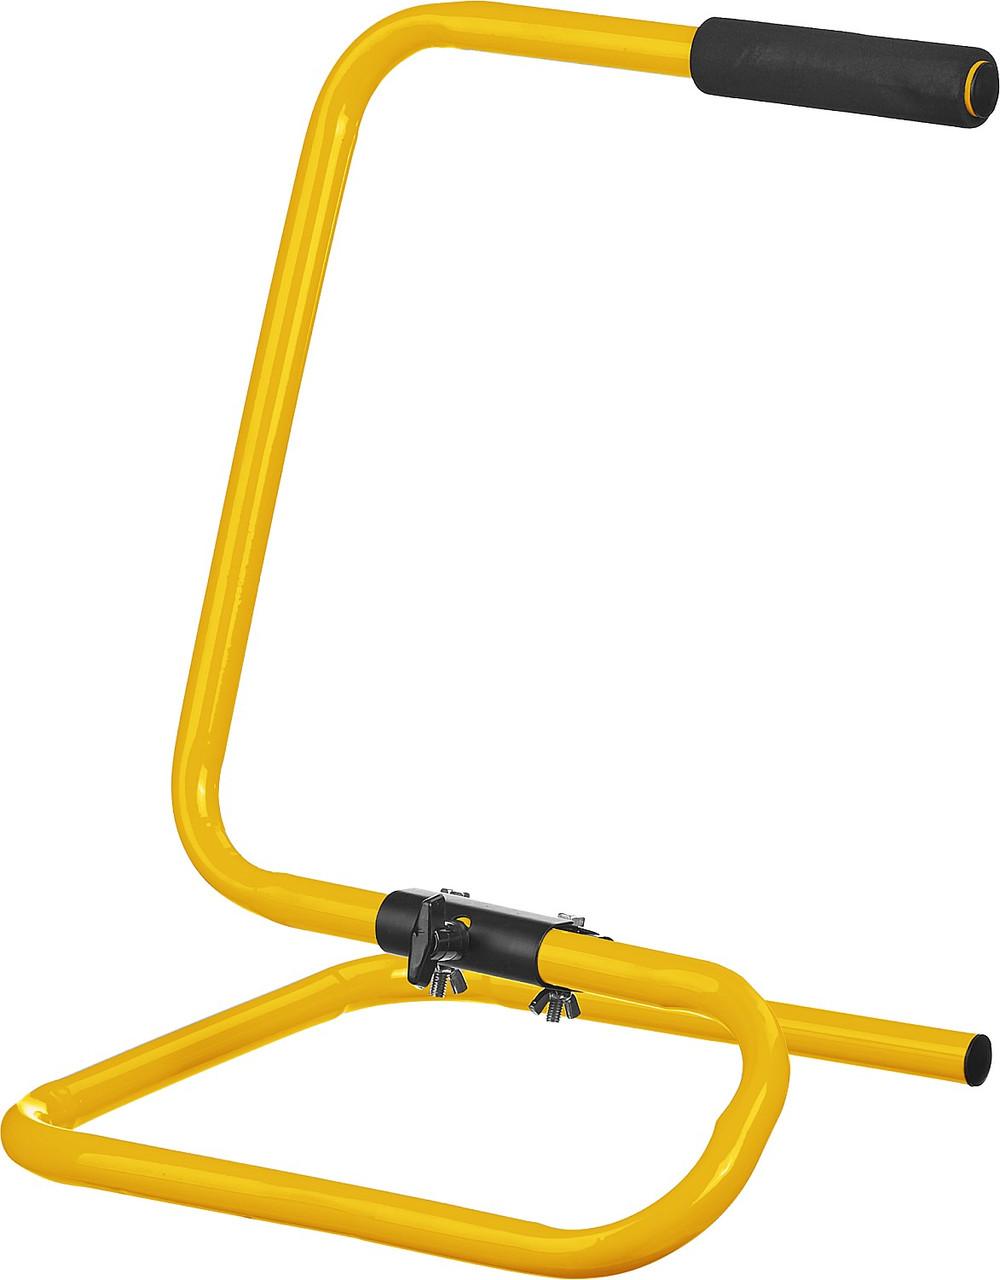 Подставка-переноска для прожектора, STAYER, MAX Stable (56923)